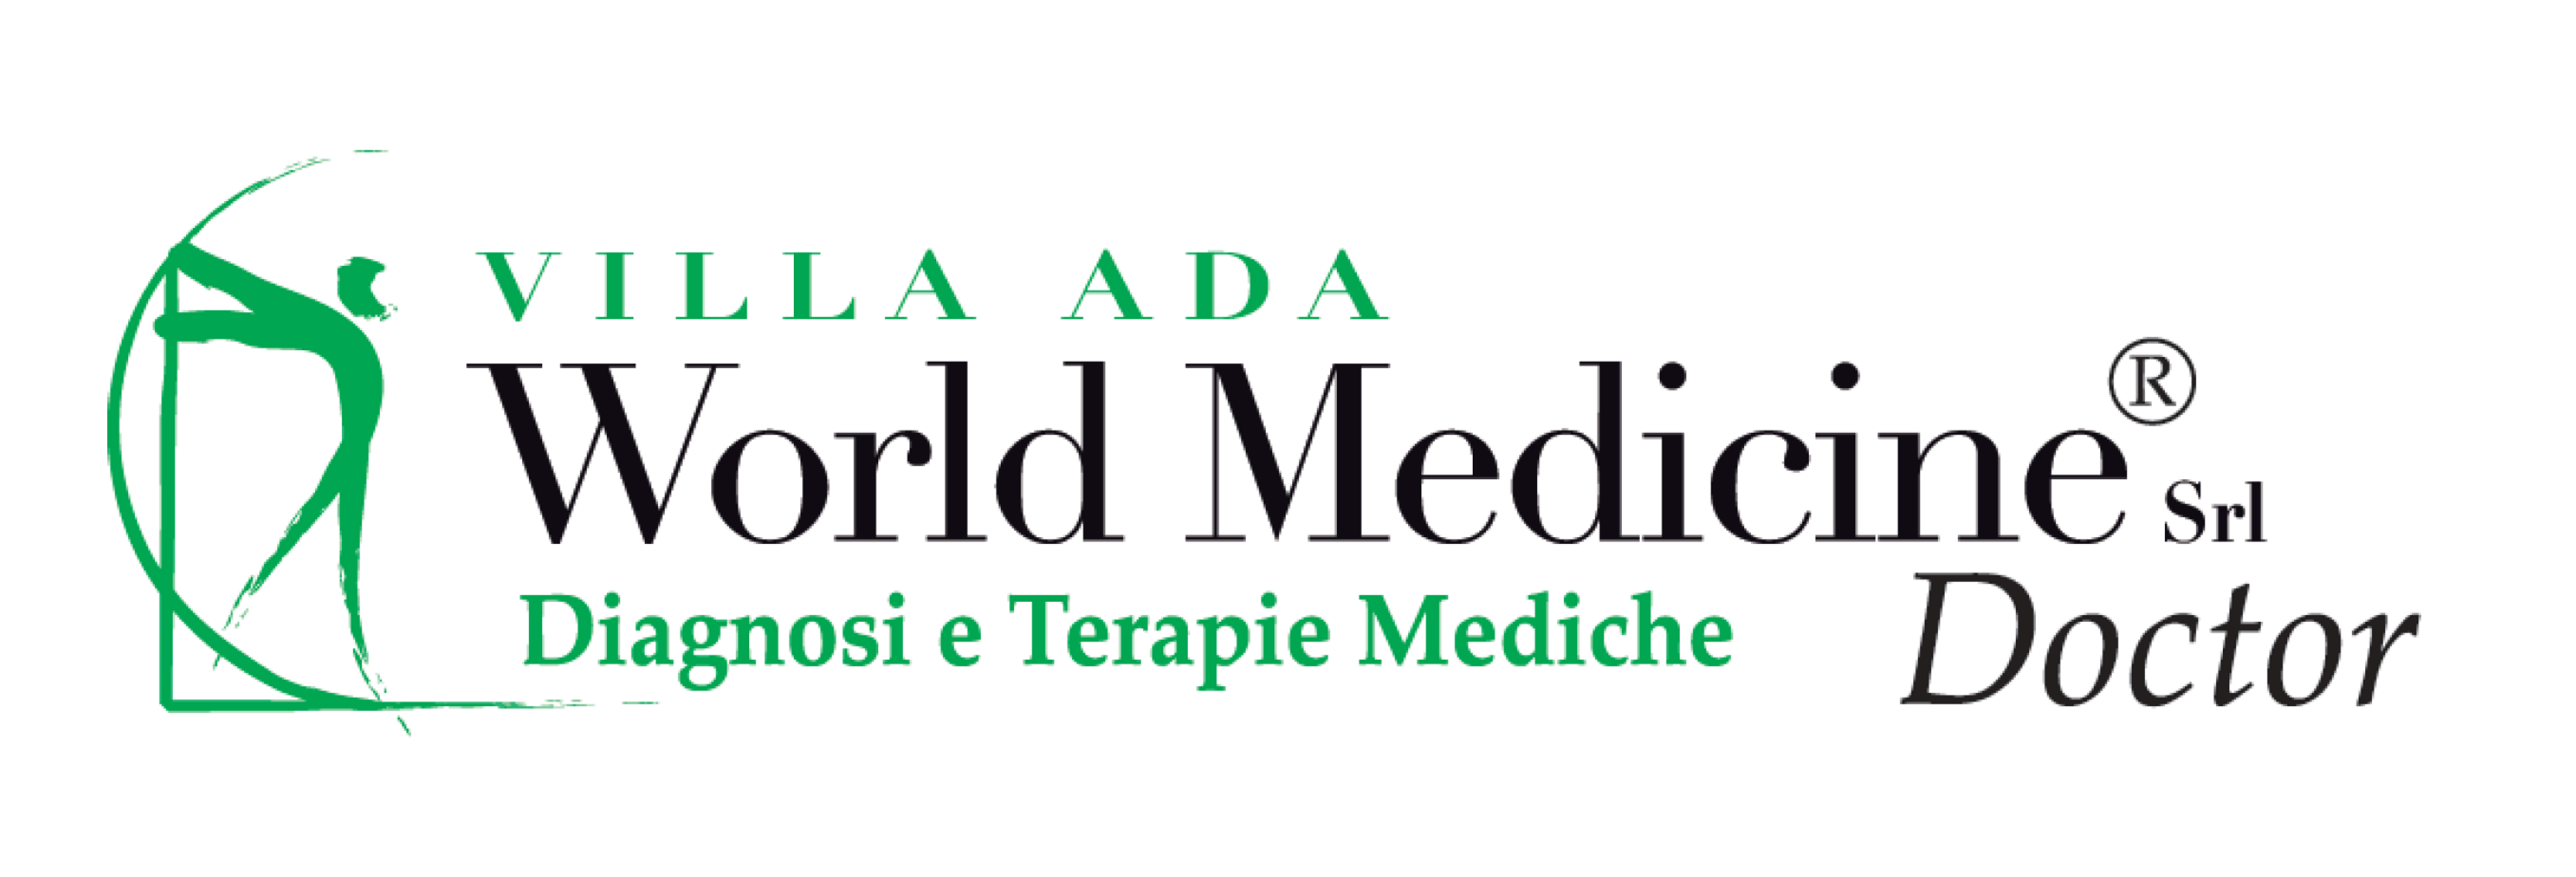 Villa Ada World Medicine® Doctor si occupa di medicina specialistica ed è  caratterizzata dallu0027ampia offerta di prestazioni e dallu0027alta  professionalità PlusPng.com  - Ada World Logo PNG